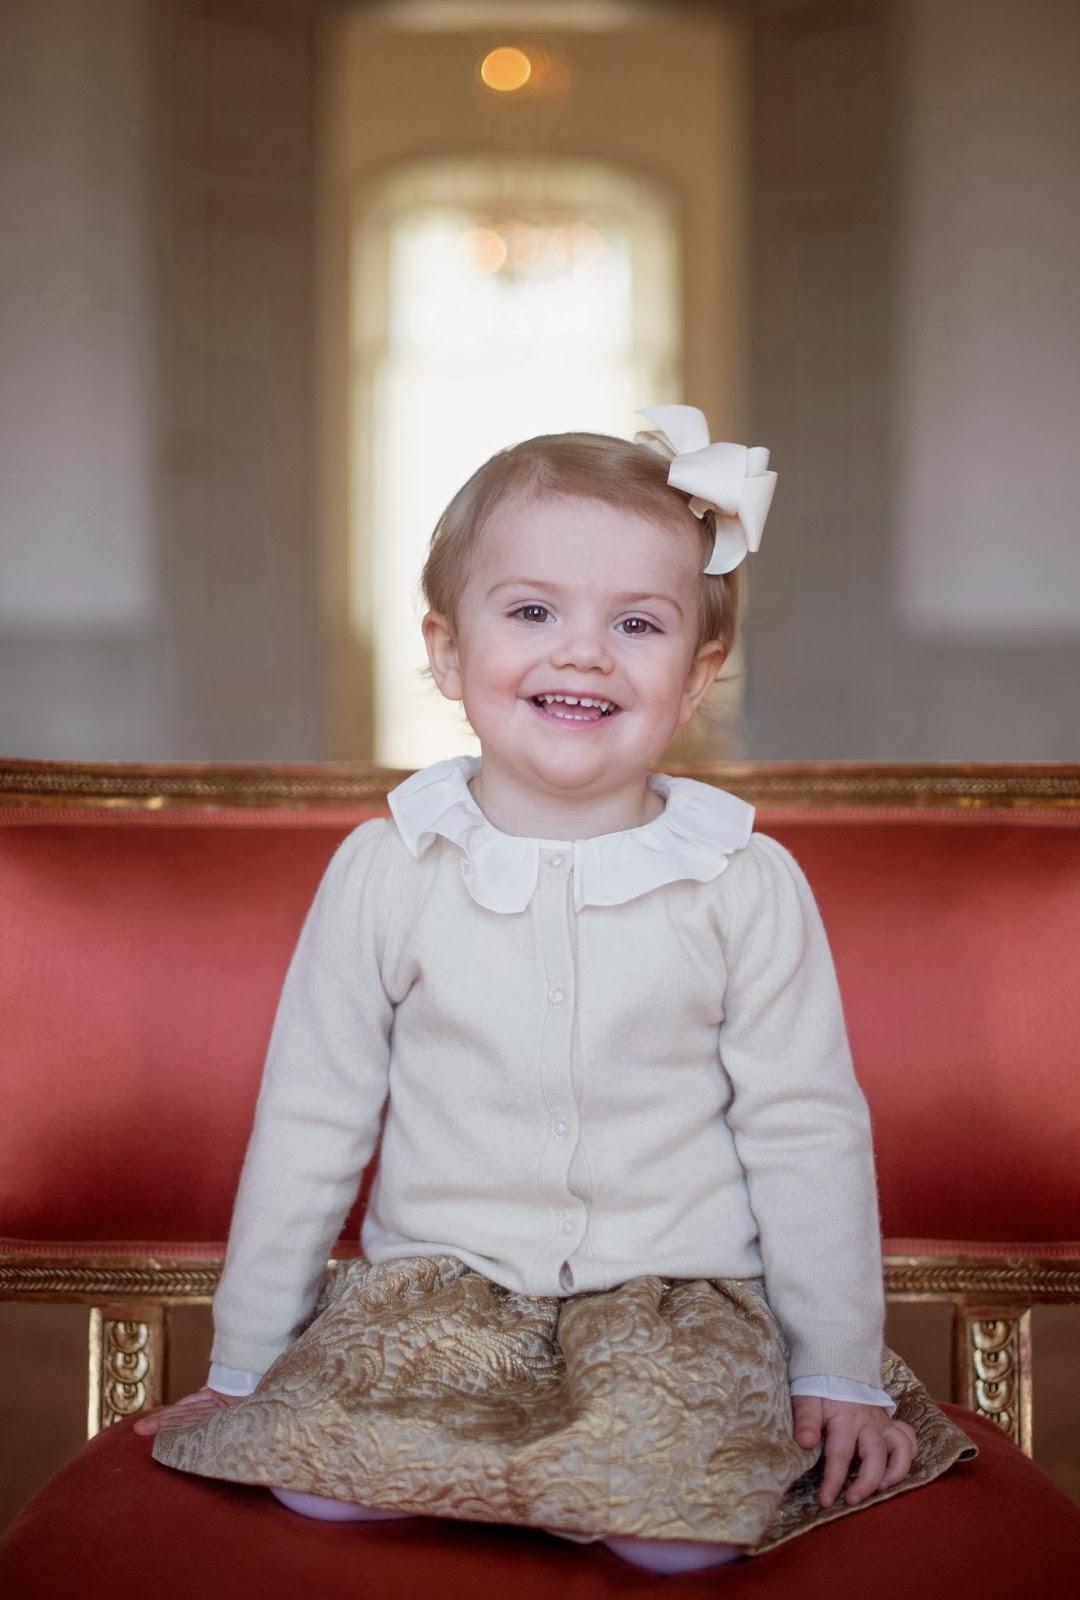 estelle fyller år Kungligheter: Prinsessan Estelle fyller 2 år idag estelle fyller år